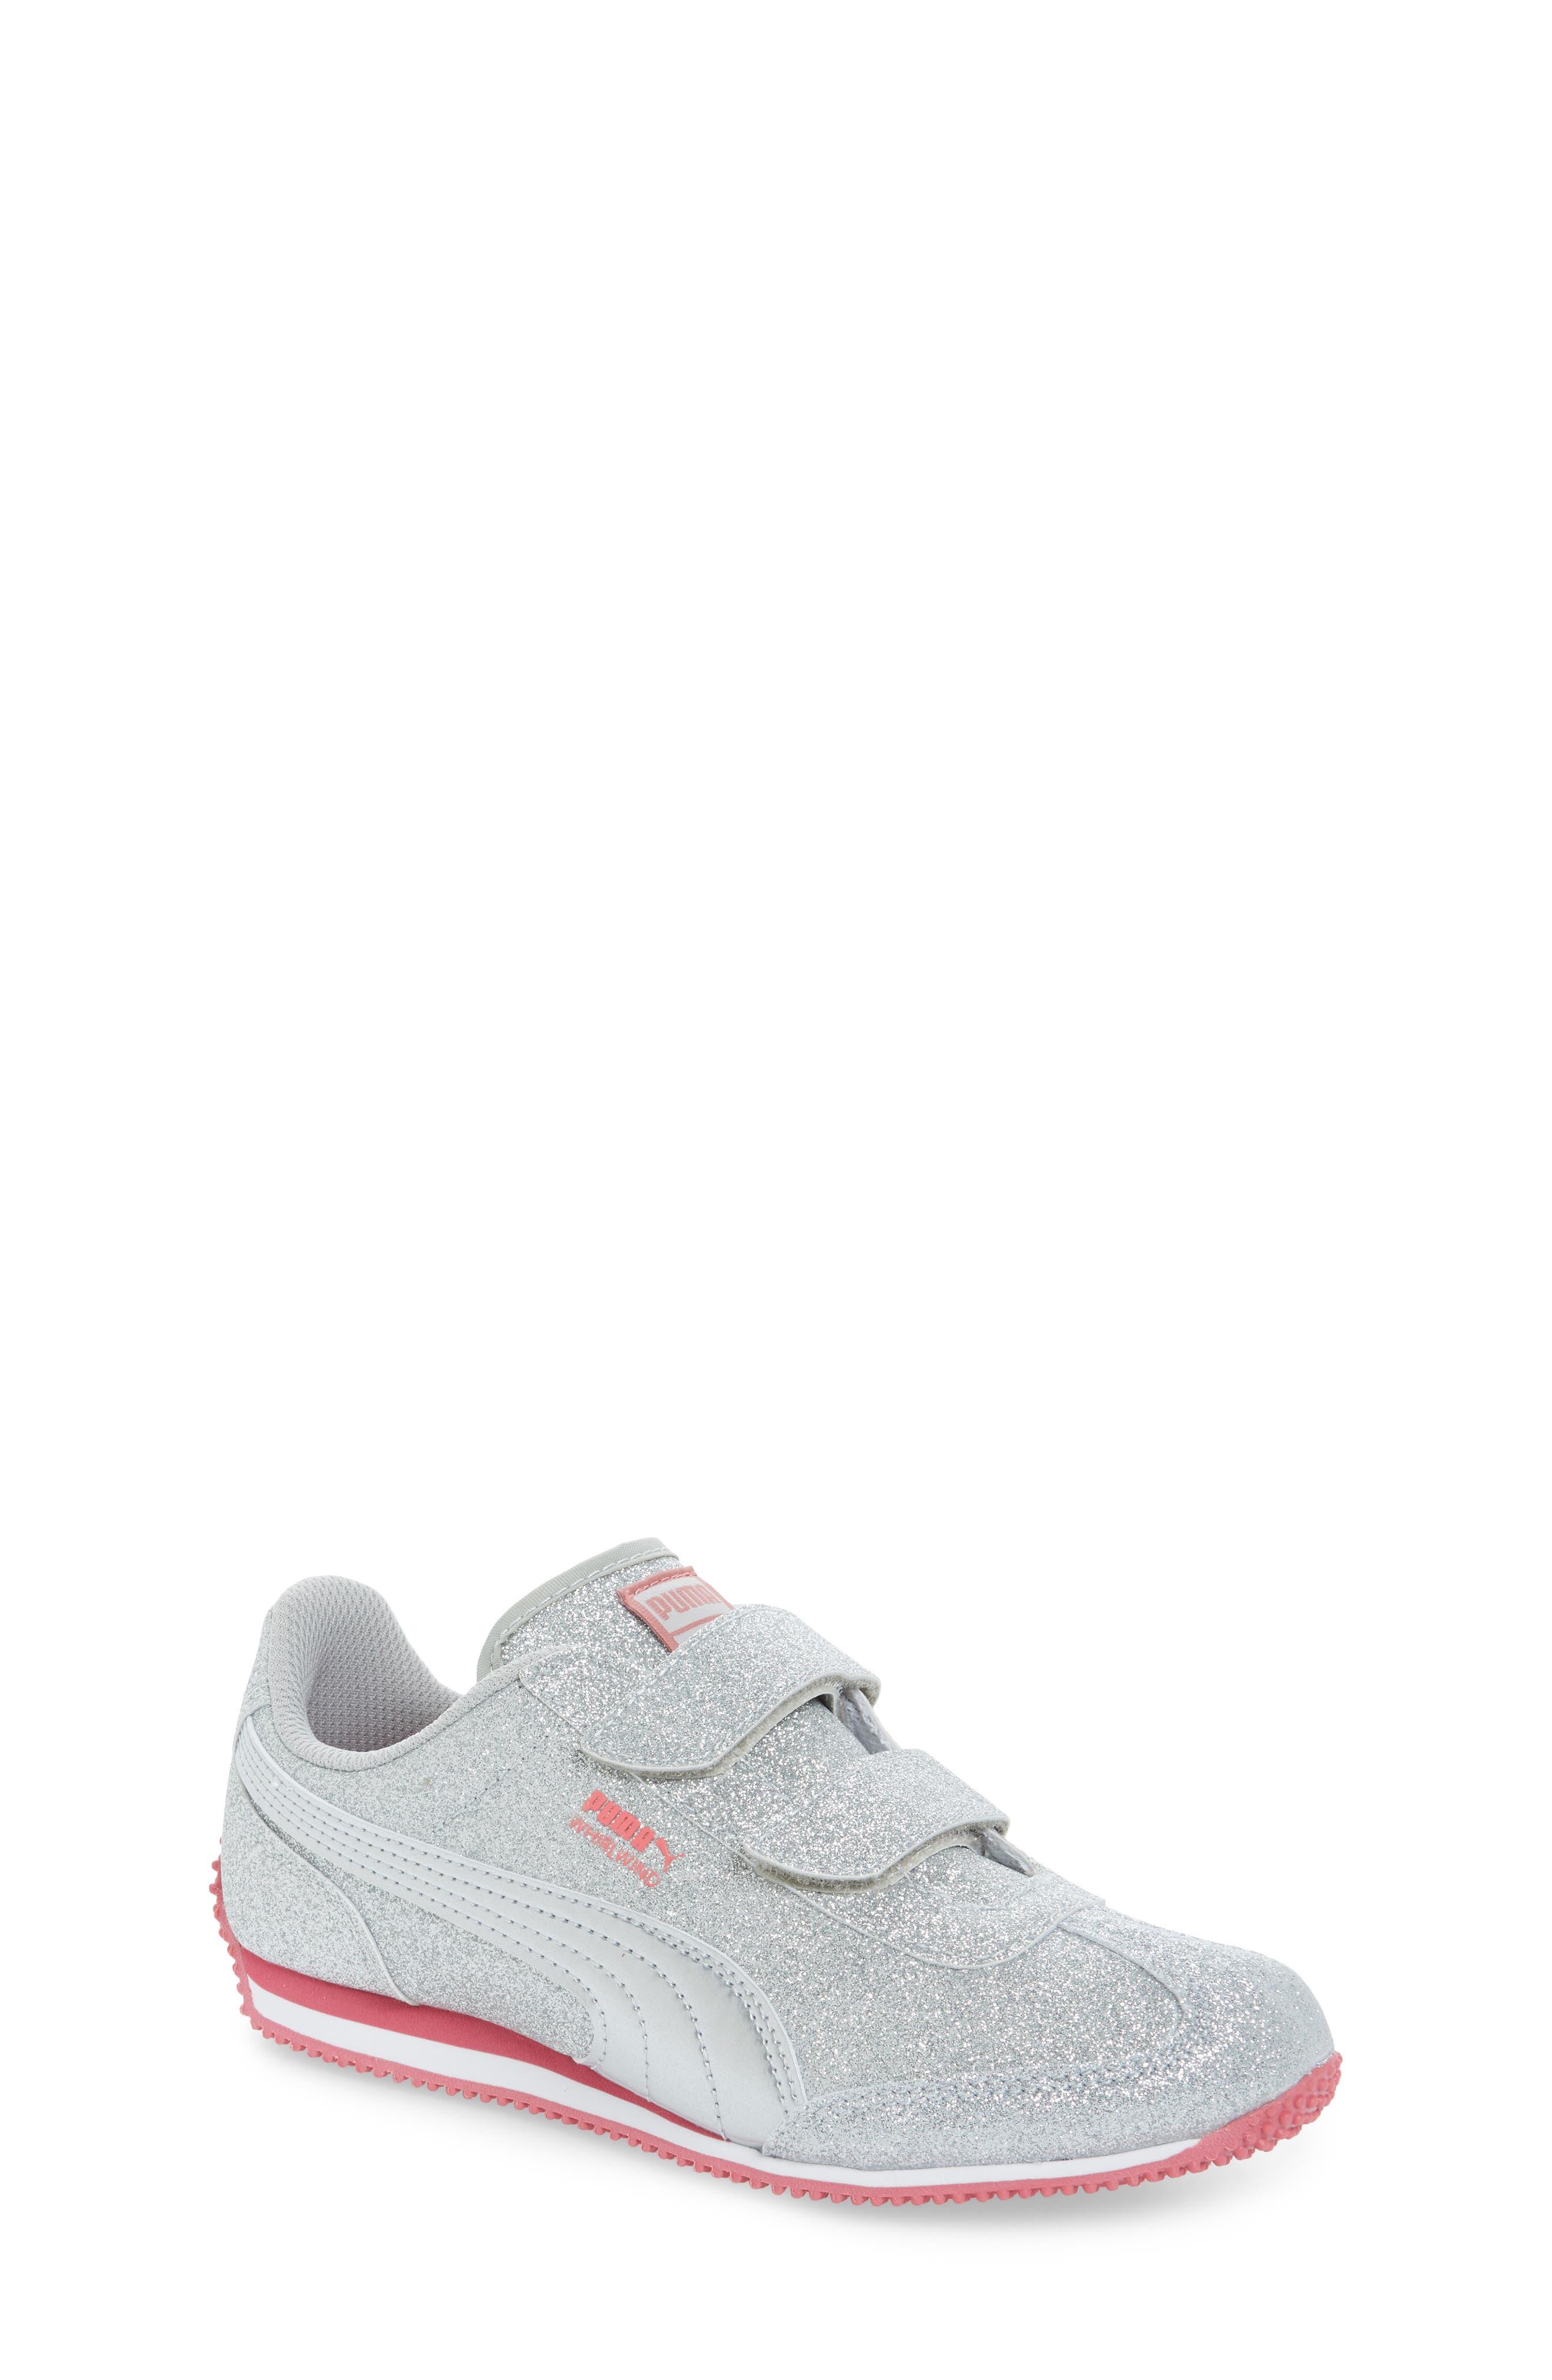 PUMA Whirlwind Glitz Sneaker (Toddler, Little Kid & Big Kid)